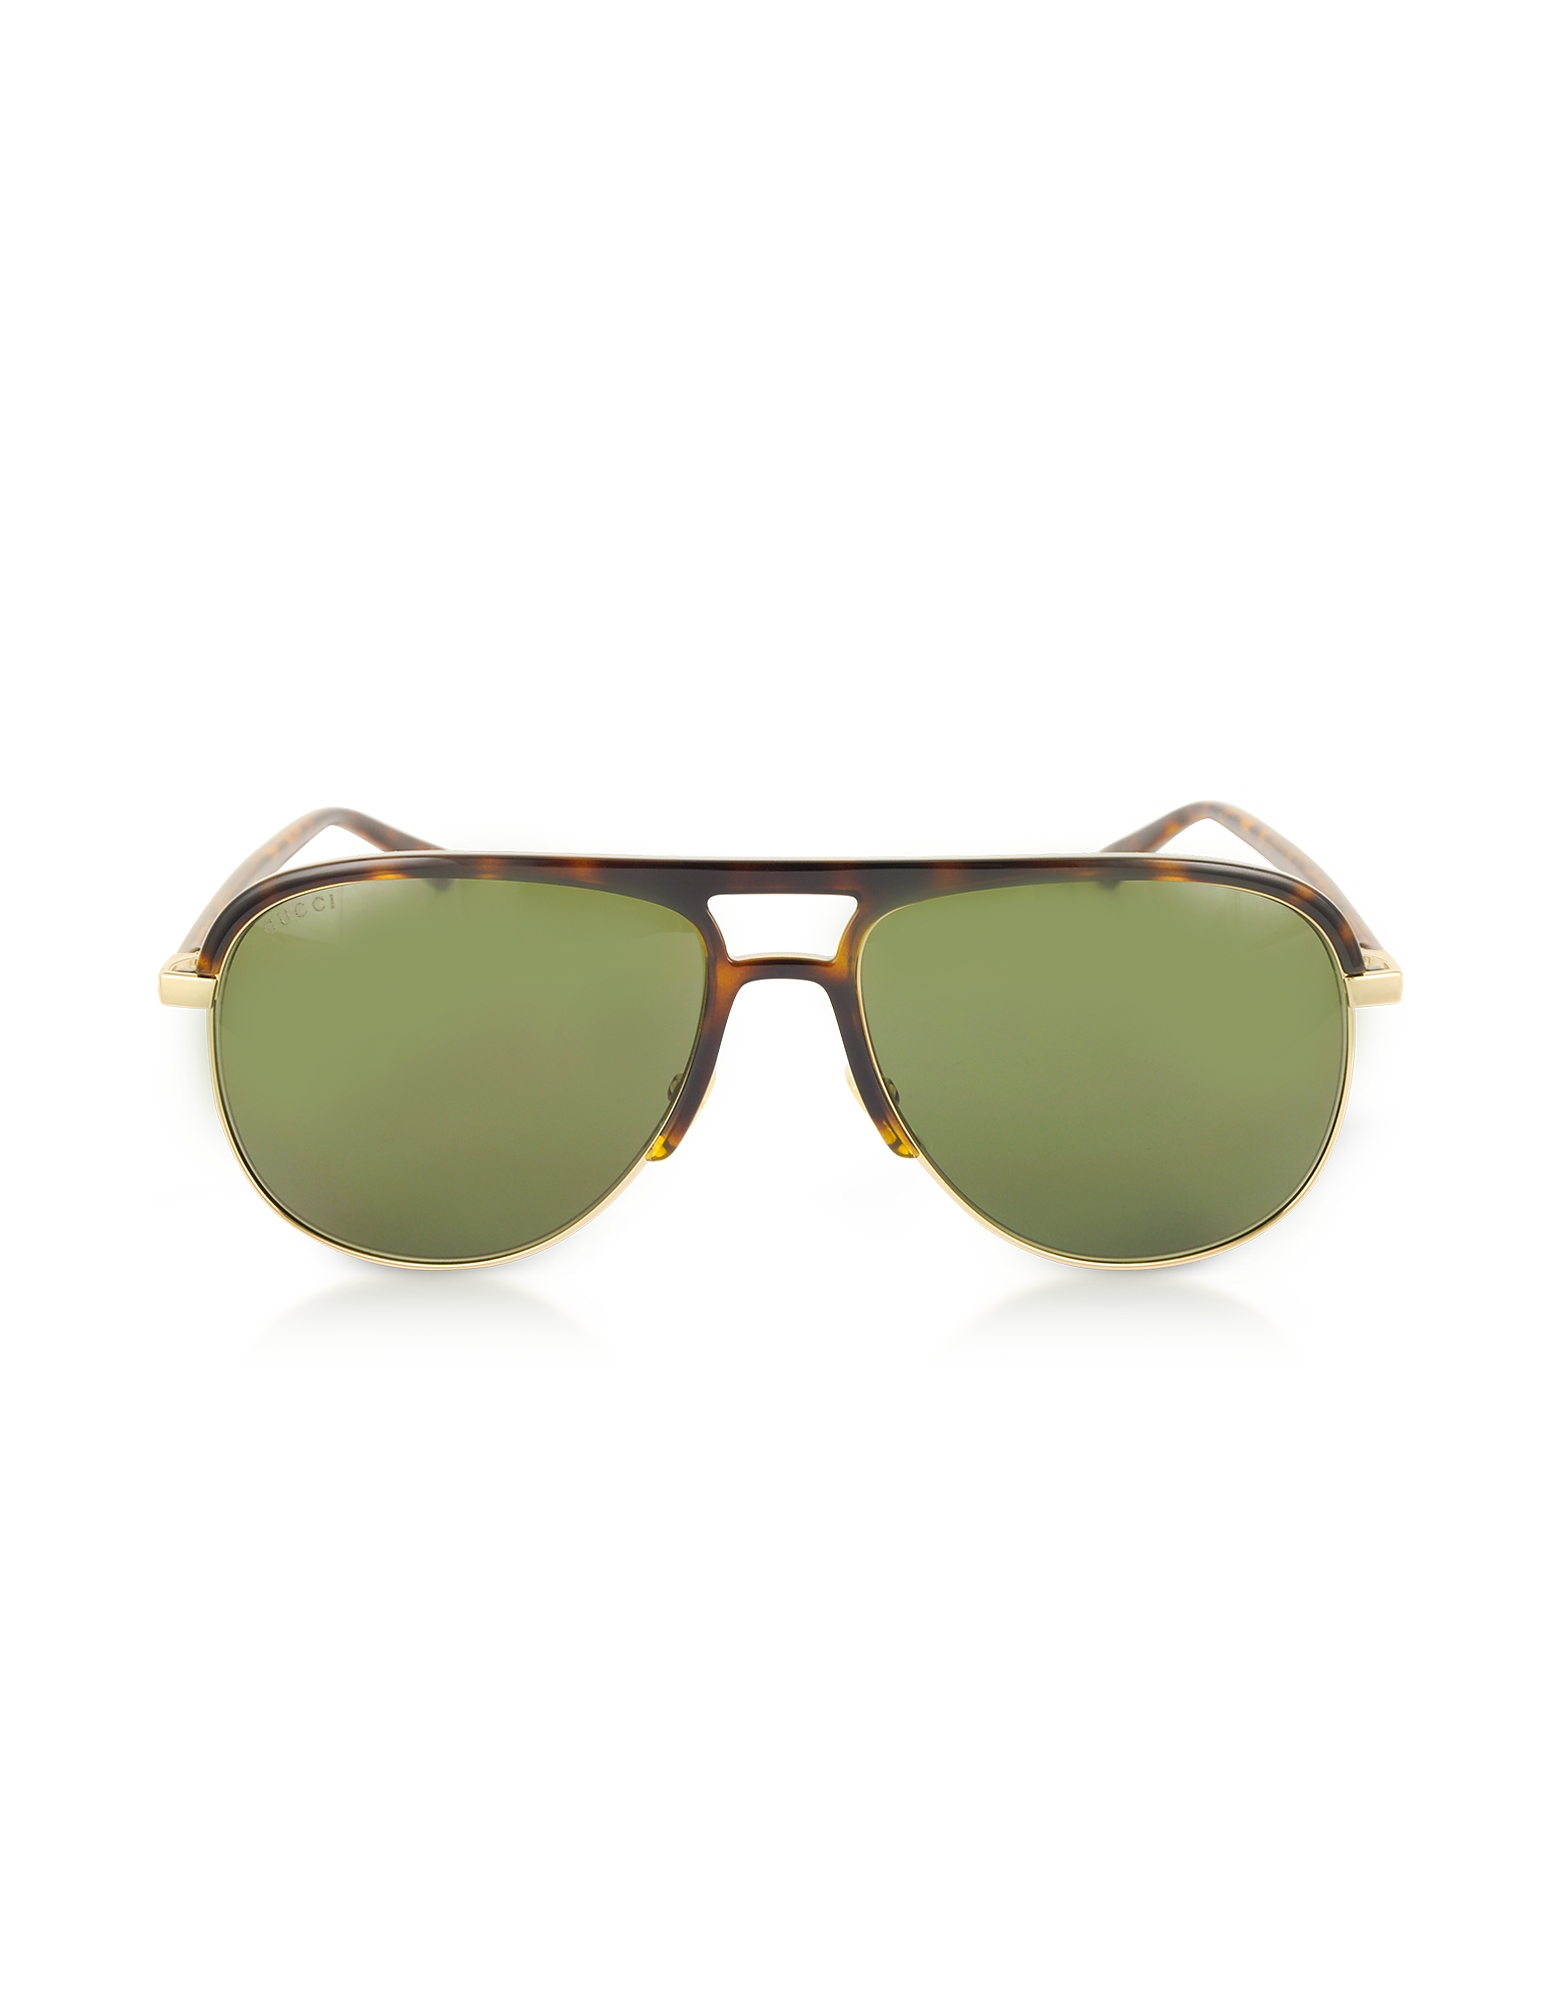 GG0292S Metal and Acetate Frame Aviator Sunglasses